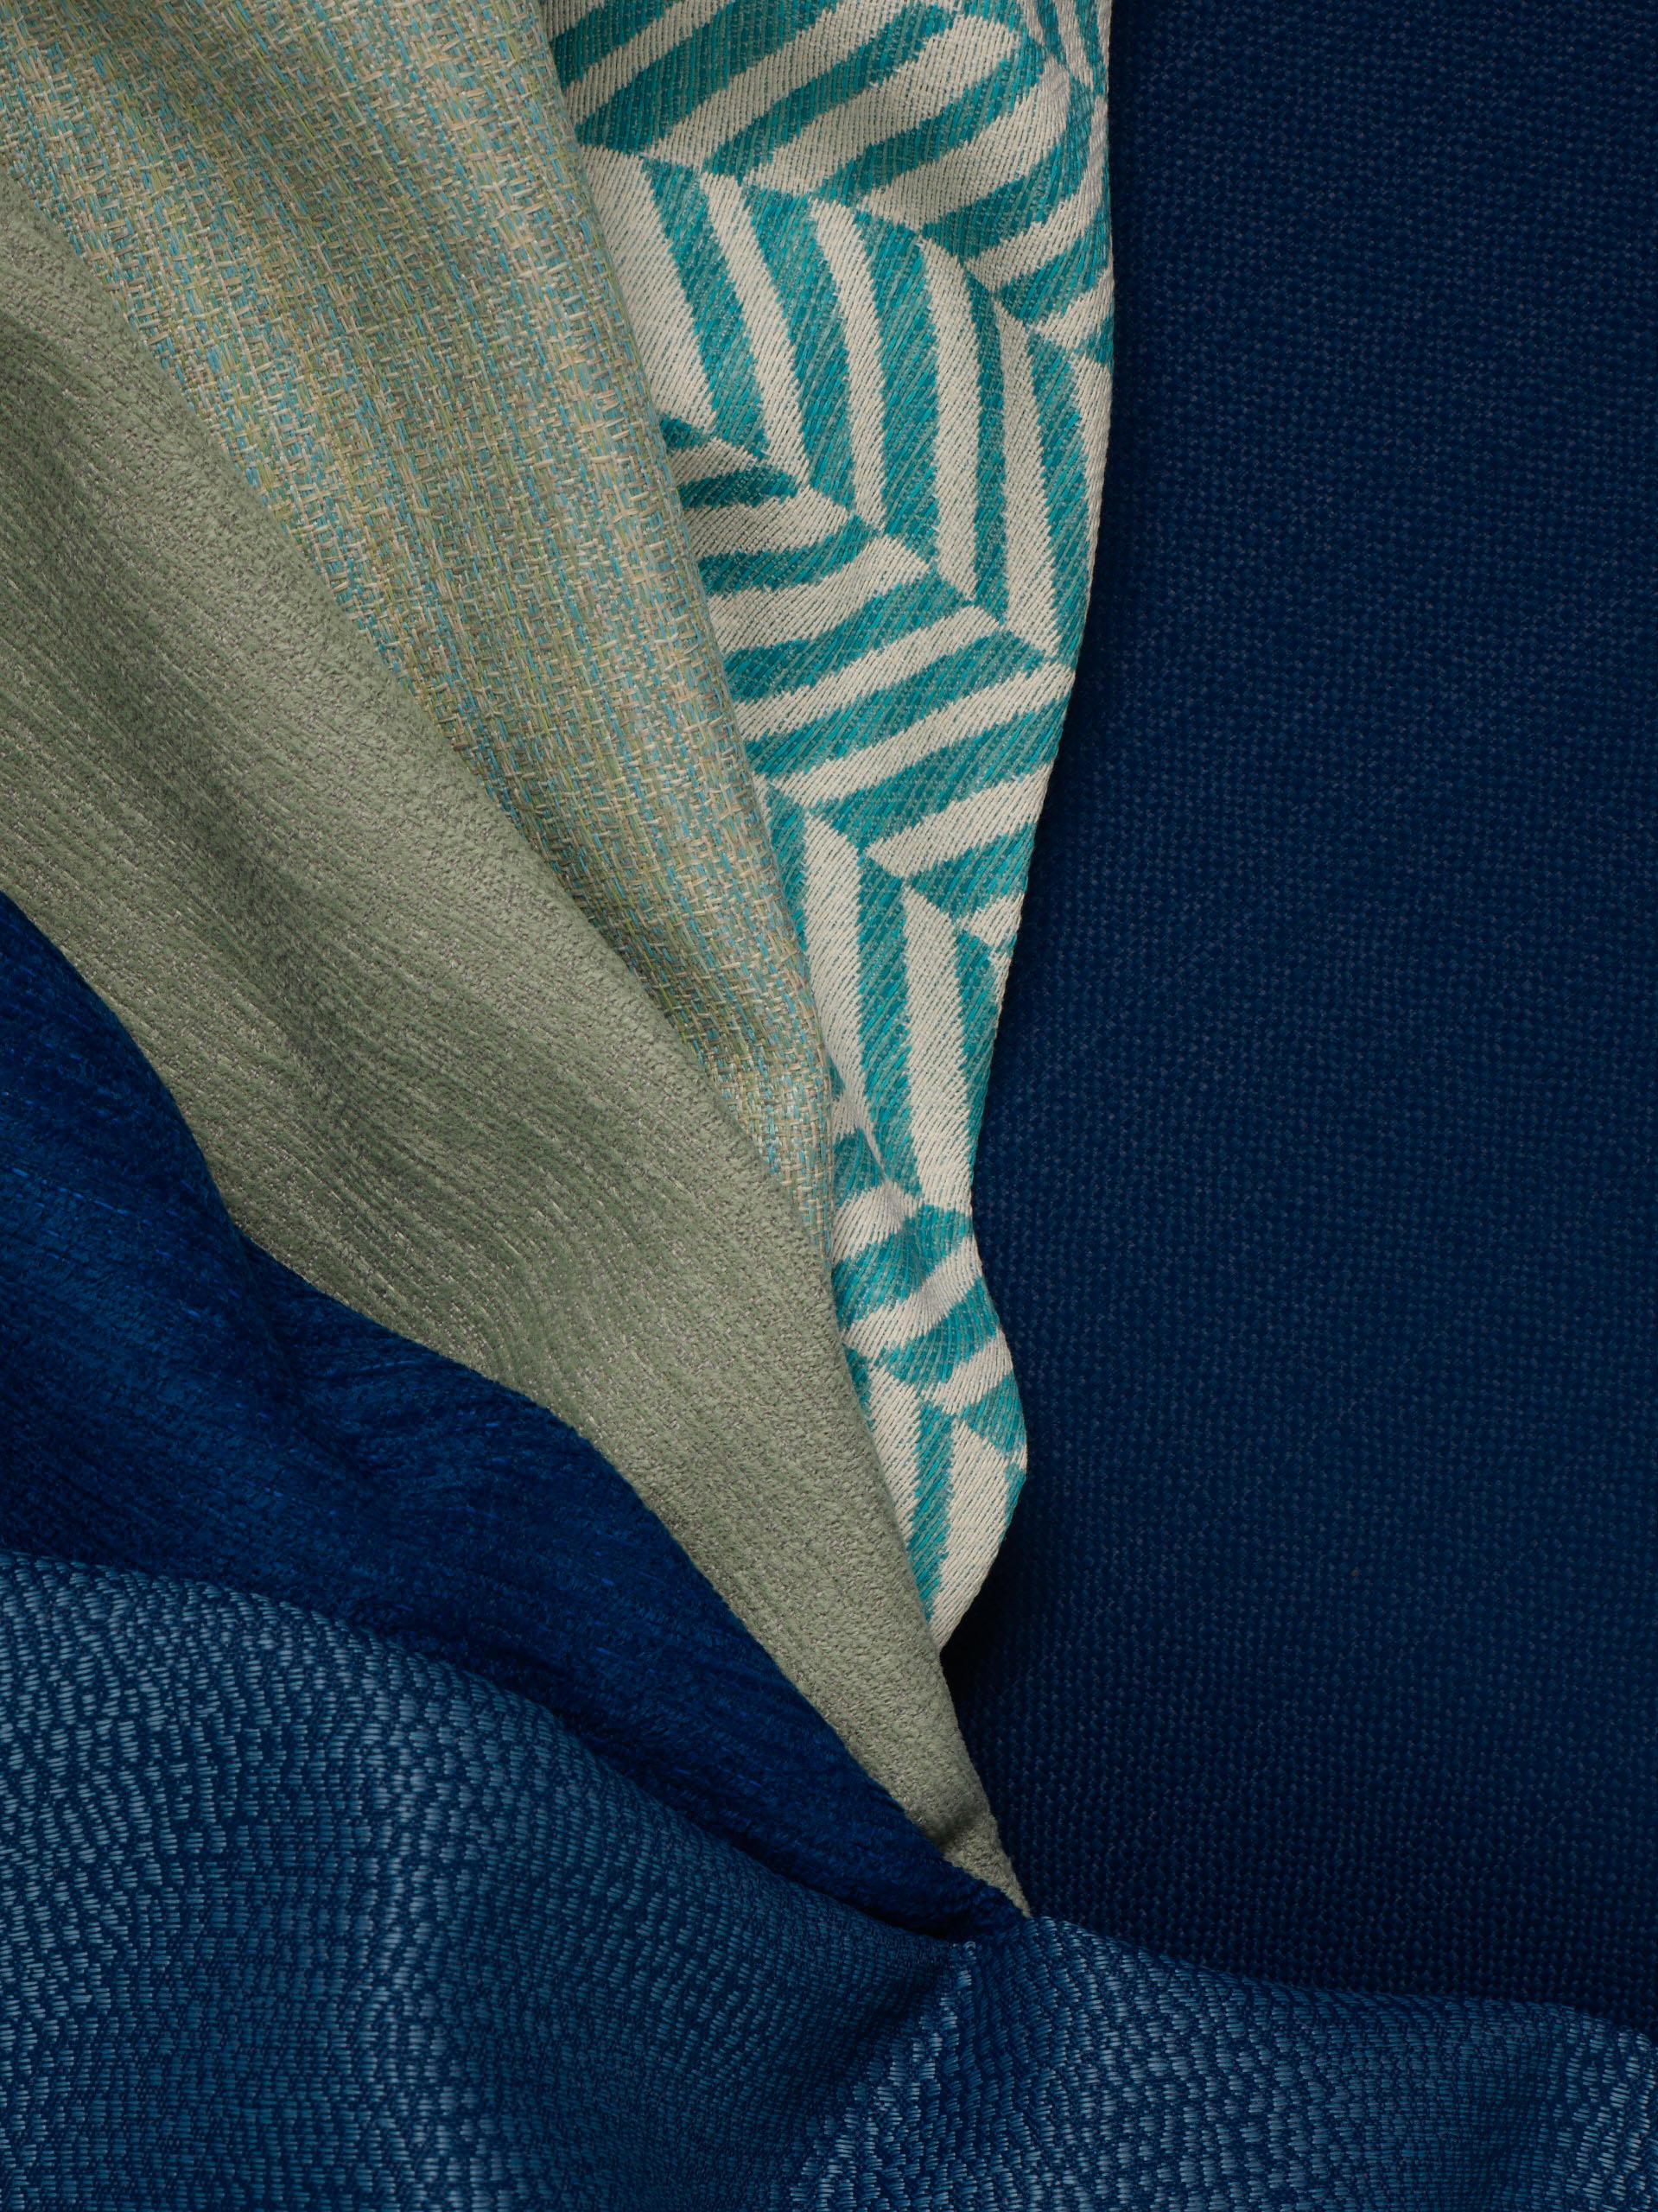 LUXURIOUS INDOOR OUTDOOR FABRICS - Outdoor upholstery fabrics from ...